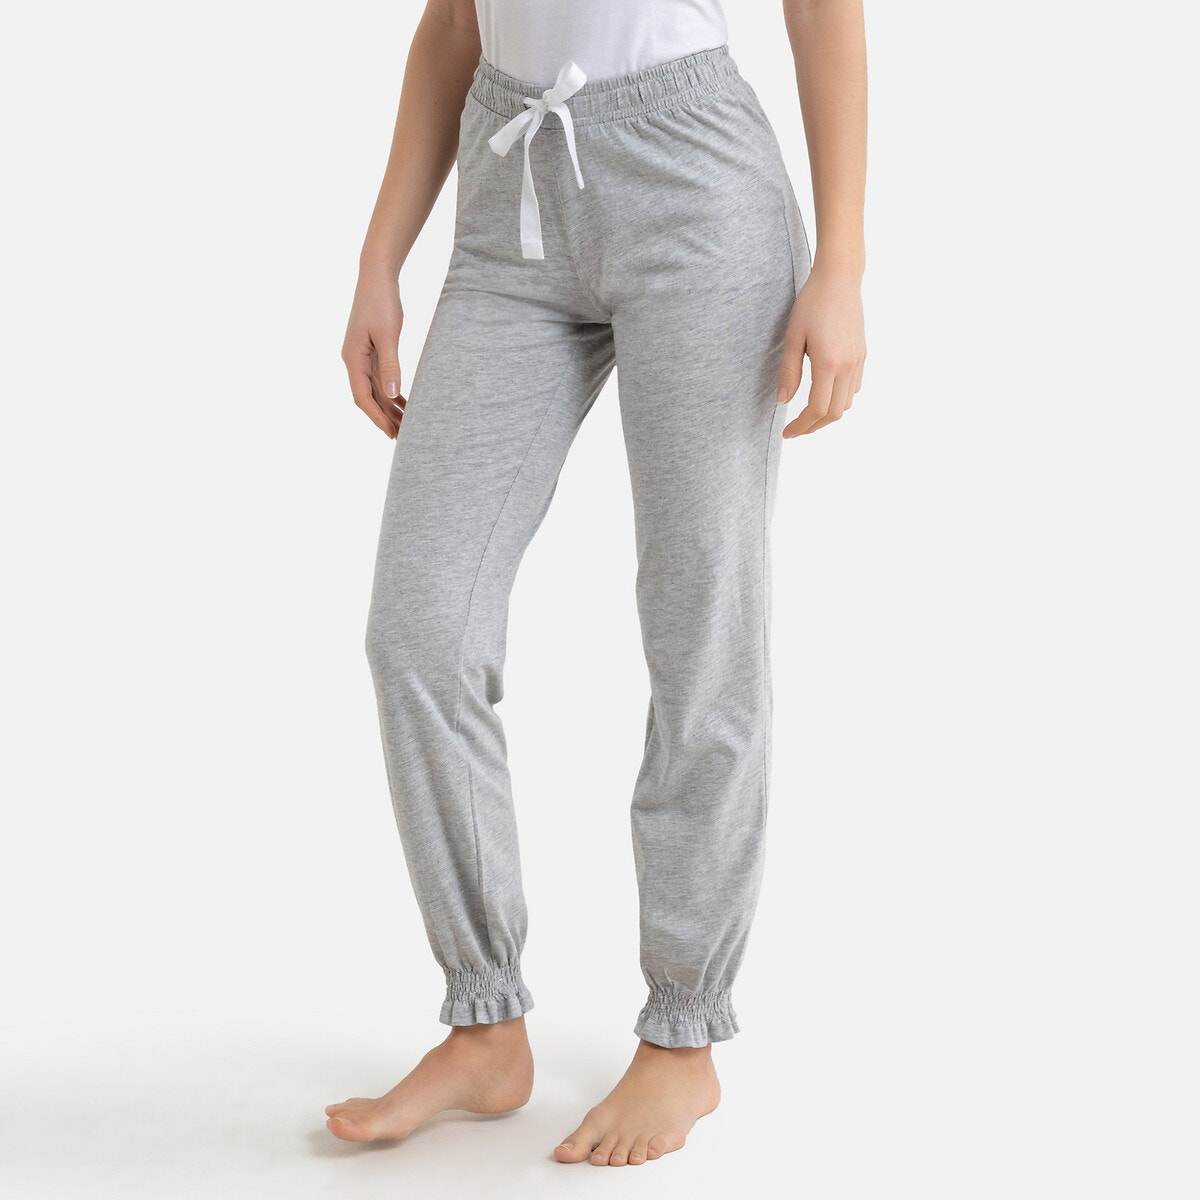 La Redoute Collections - Βαμβακερό παντελόνι πυτζάμα 324440440 - 3687&0001